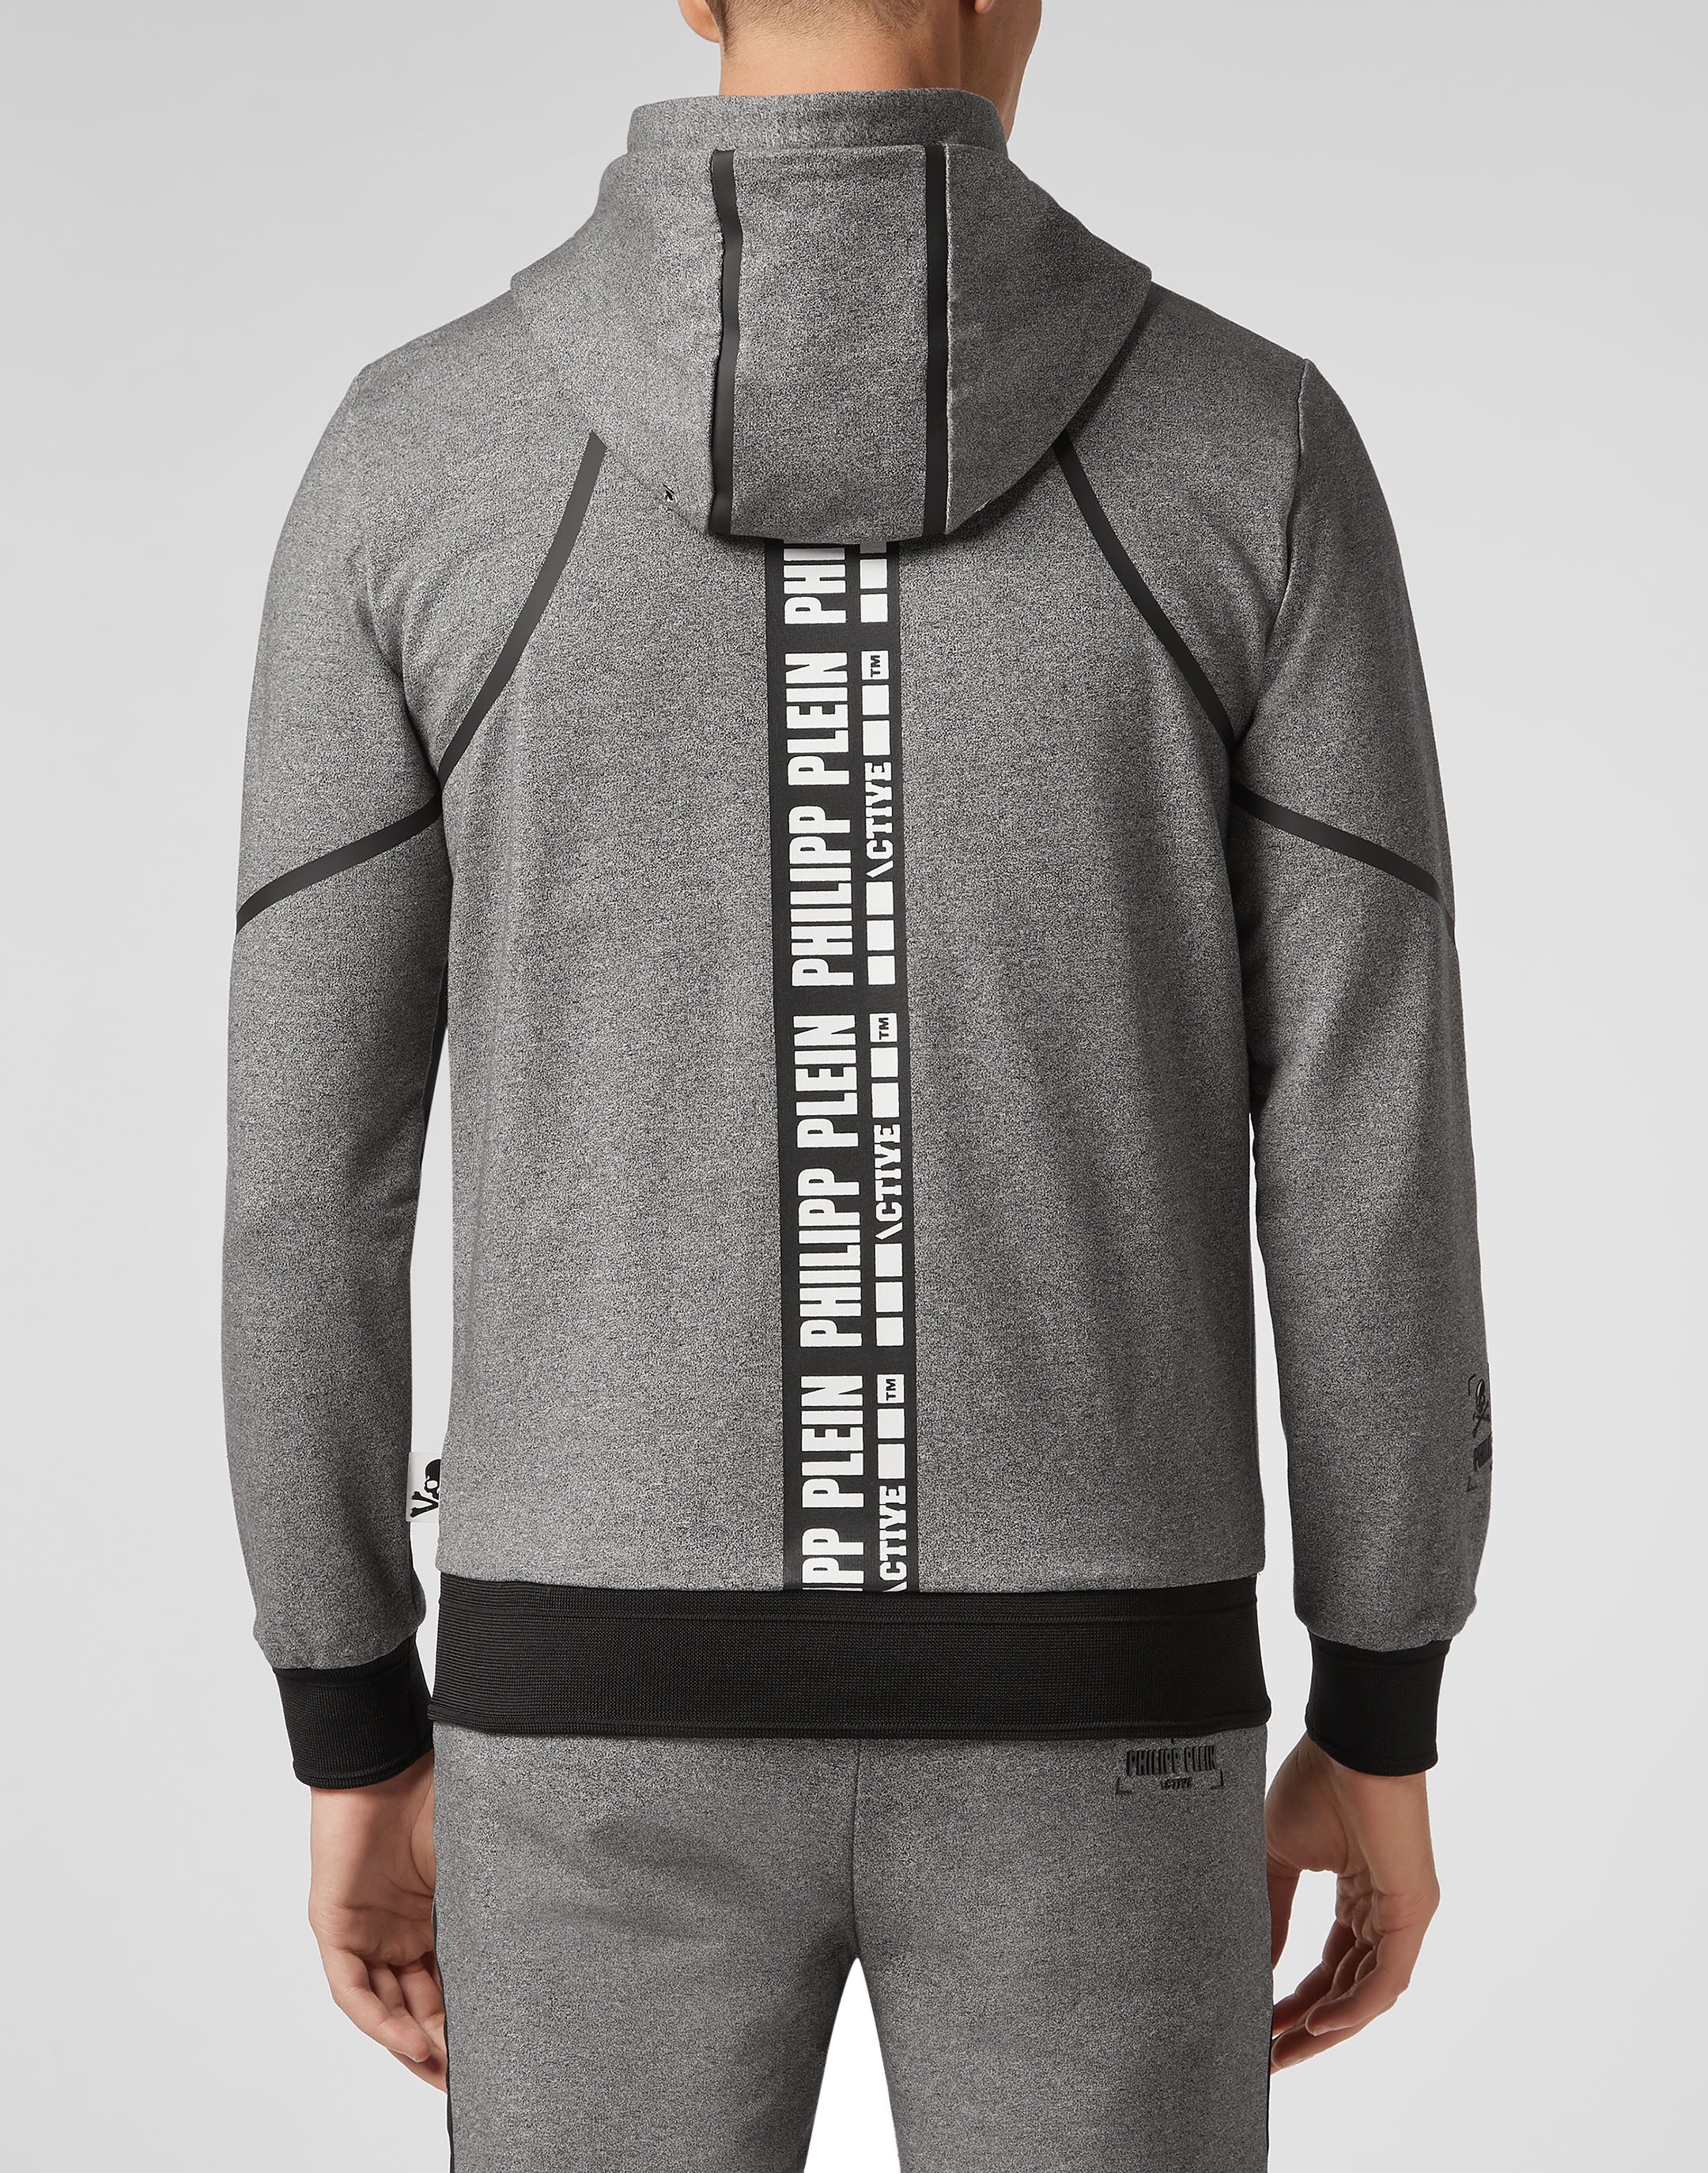 Hoodie Sweatjacket Geometric   Philipp Plein d3cf1e5b1a4